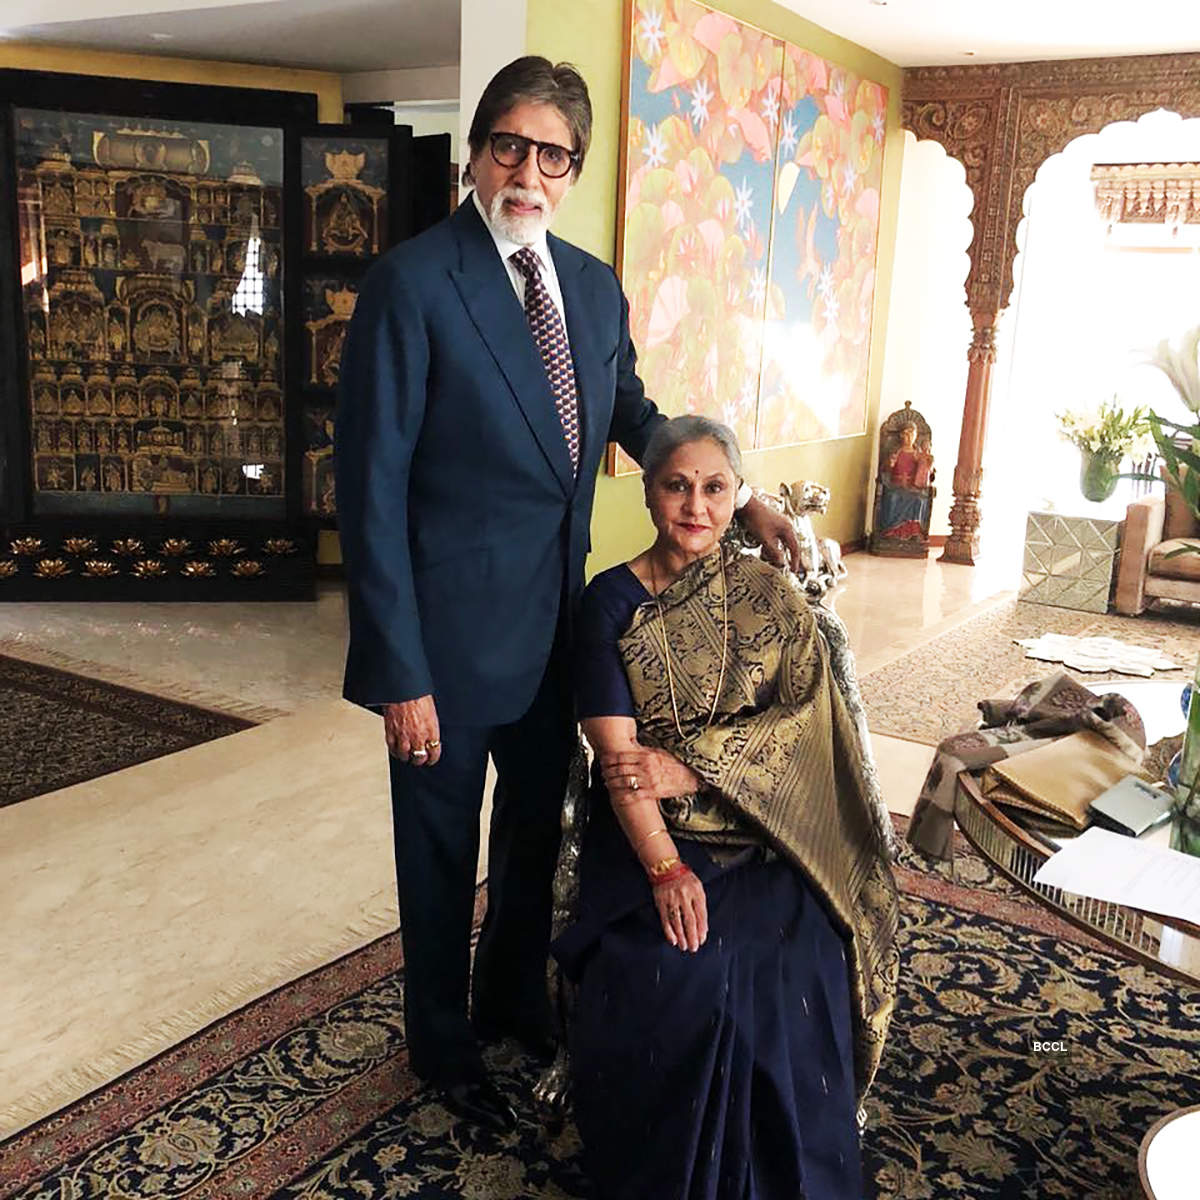 Unmissable moments of Amitabh-Jaya Bachchan on silver screen